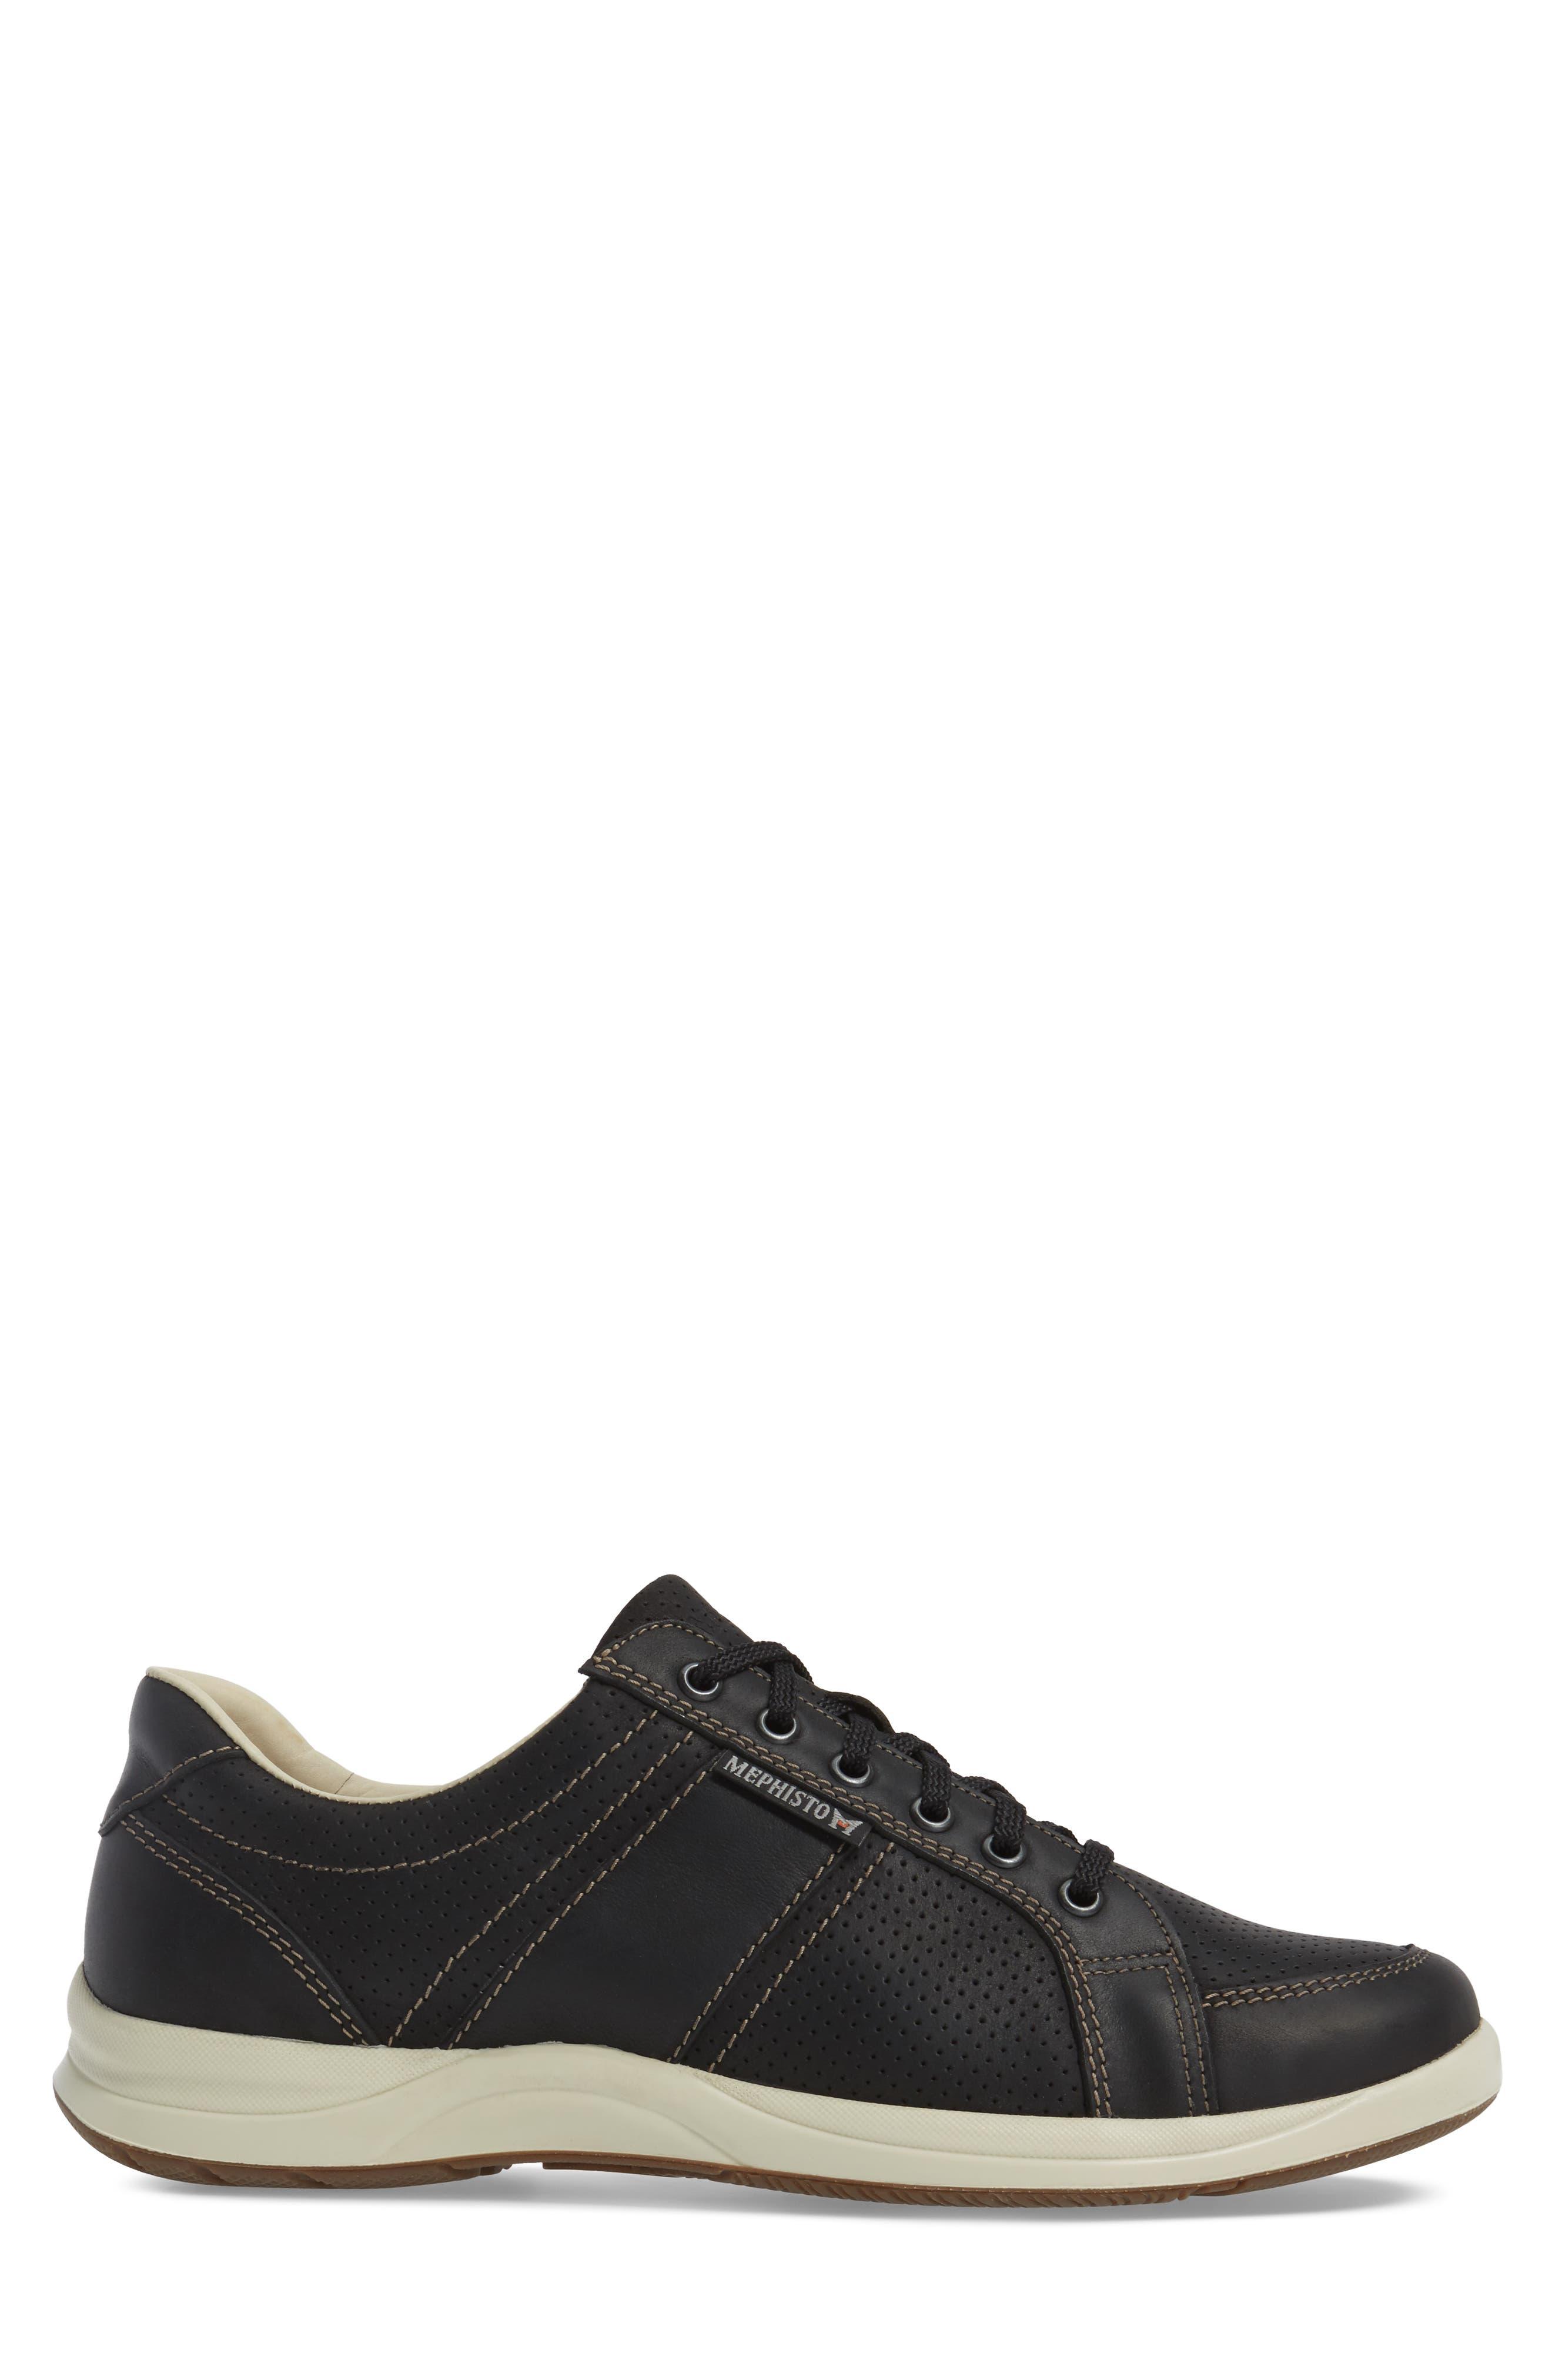 'Hero' Perforated Sneaker,                             Alternate thumbnail 3, color,                             Black Nubuck Leather